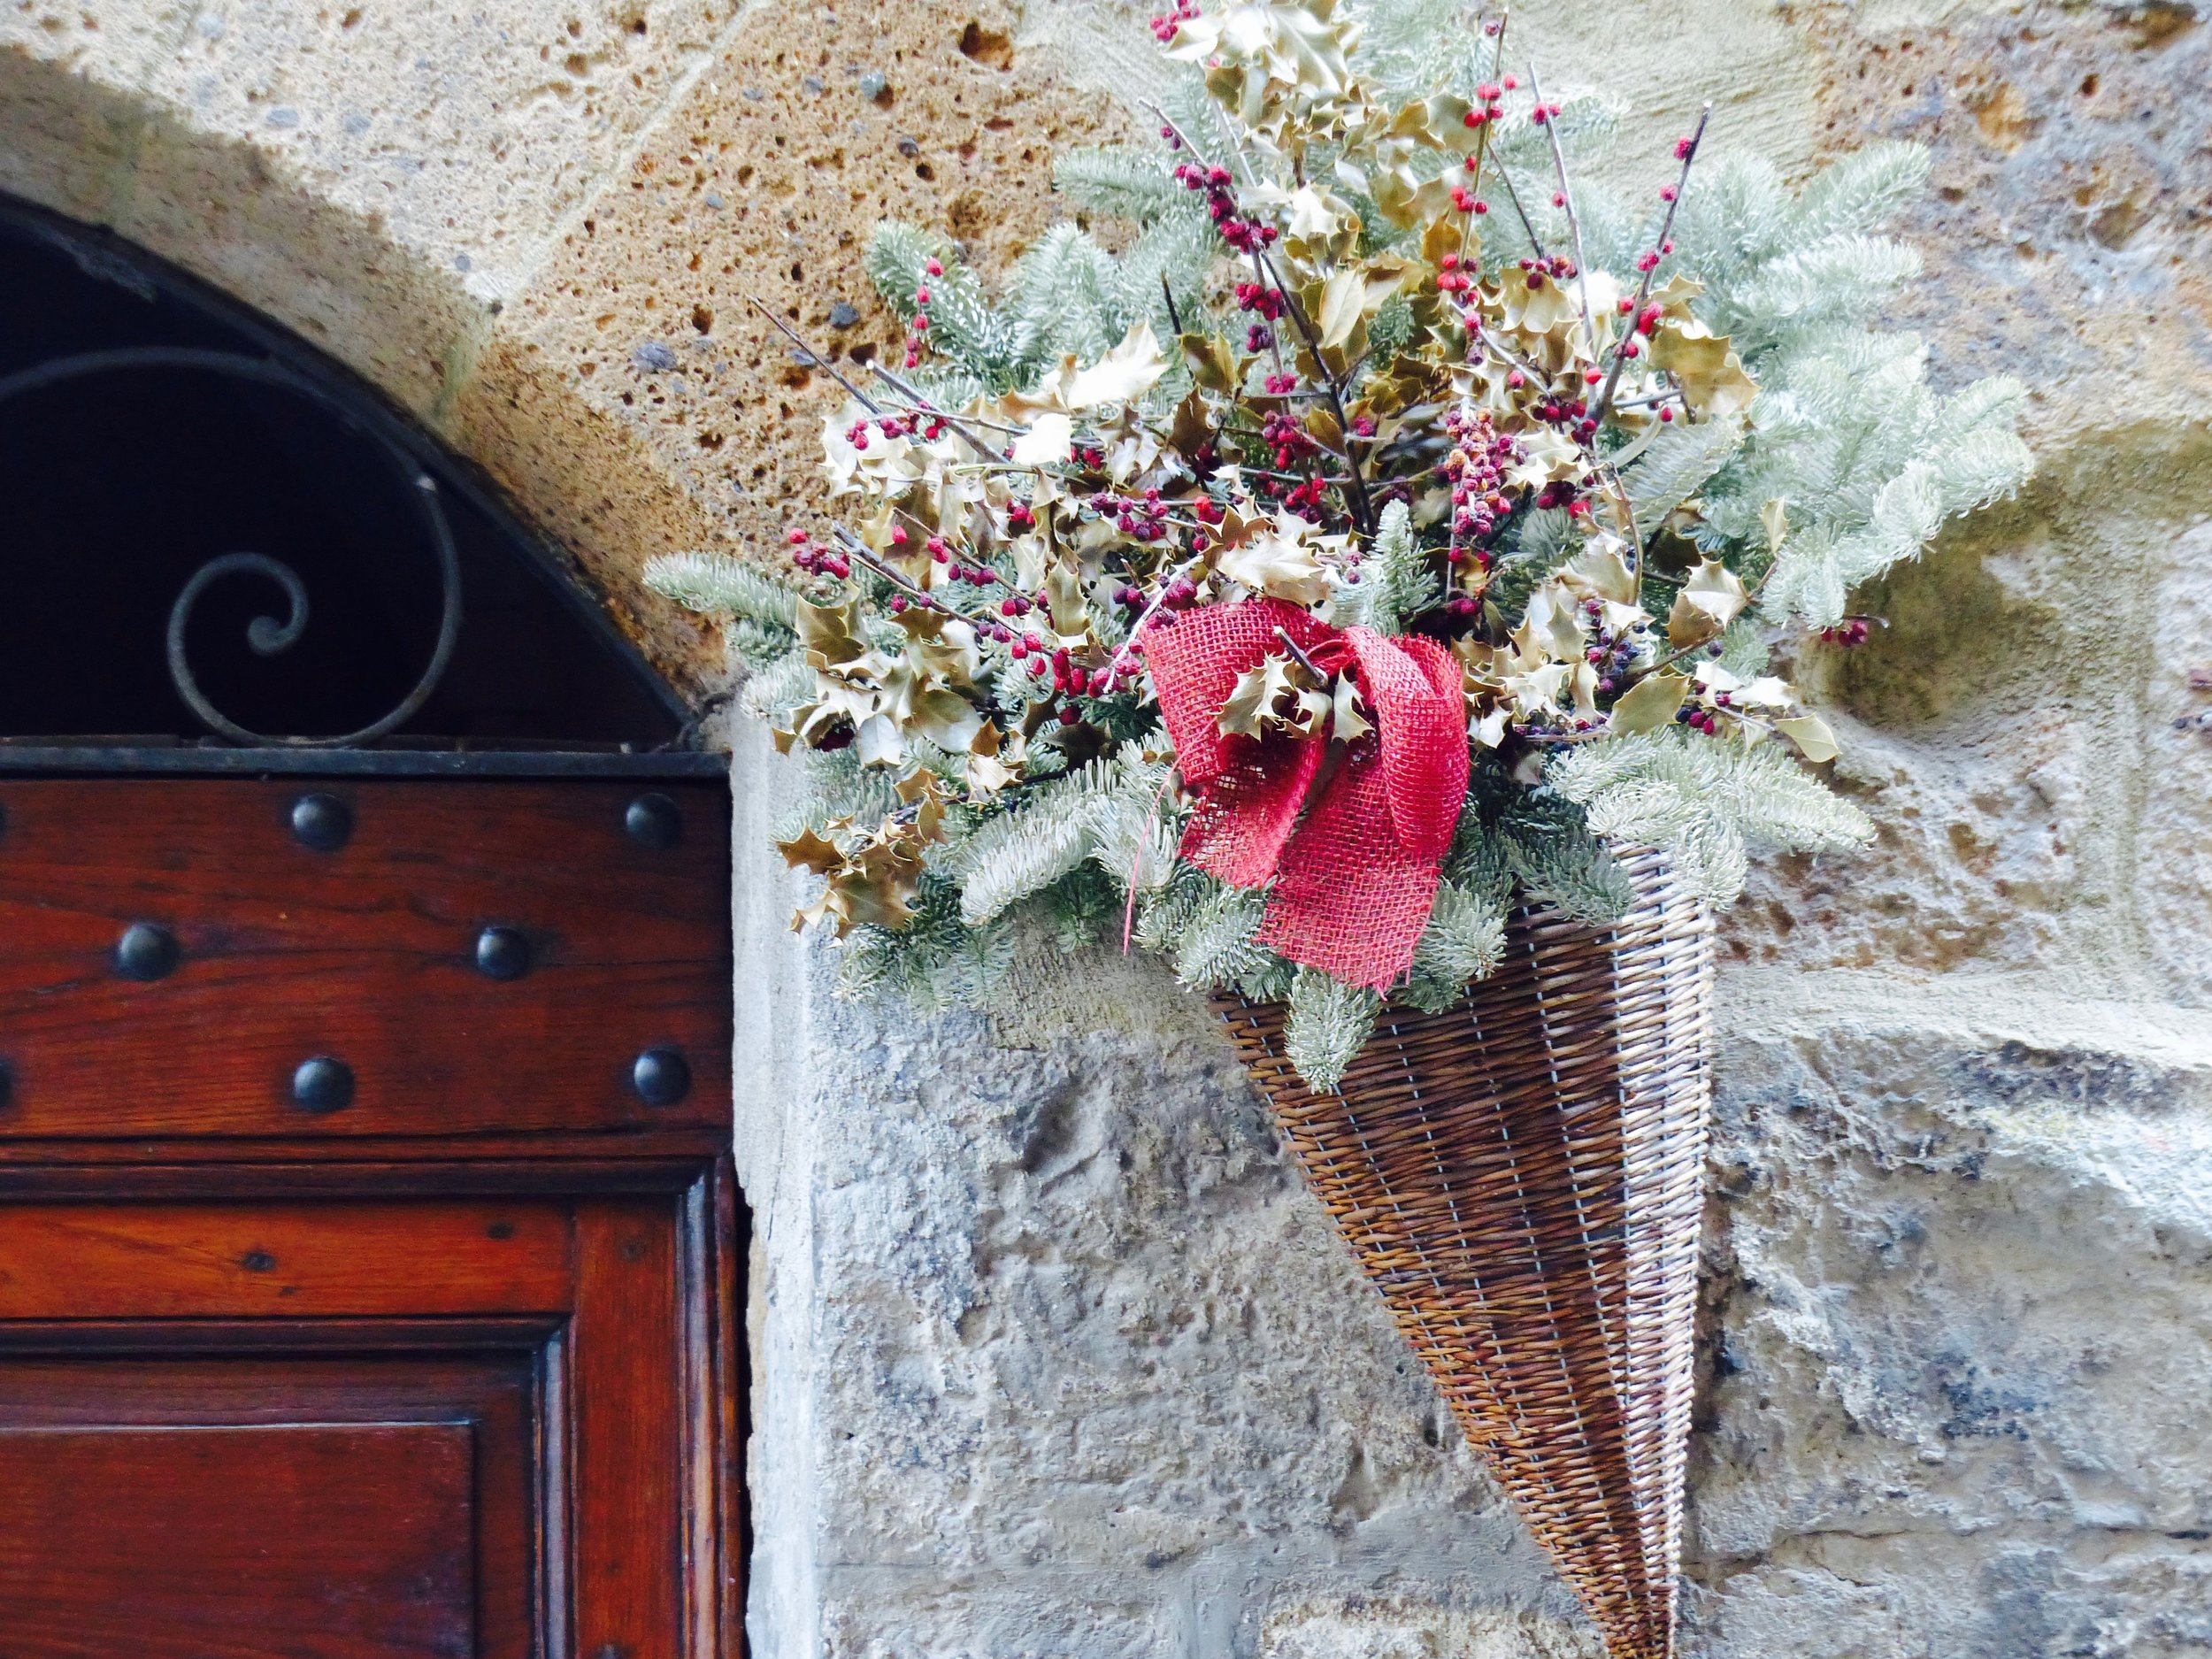 orvieto_flowers.jpg